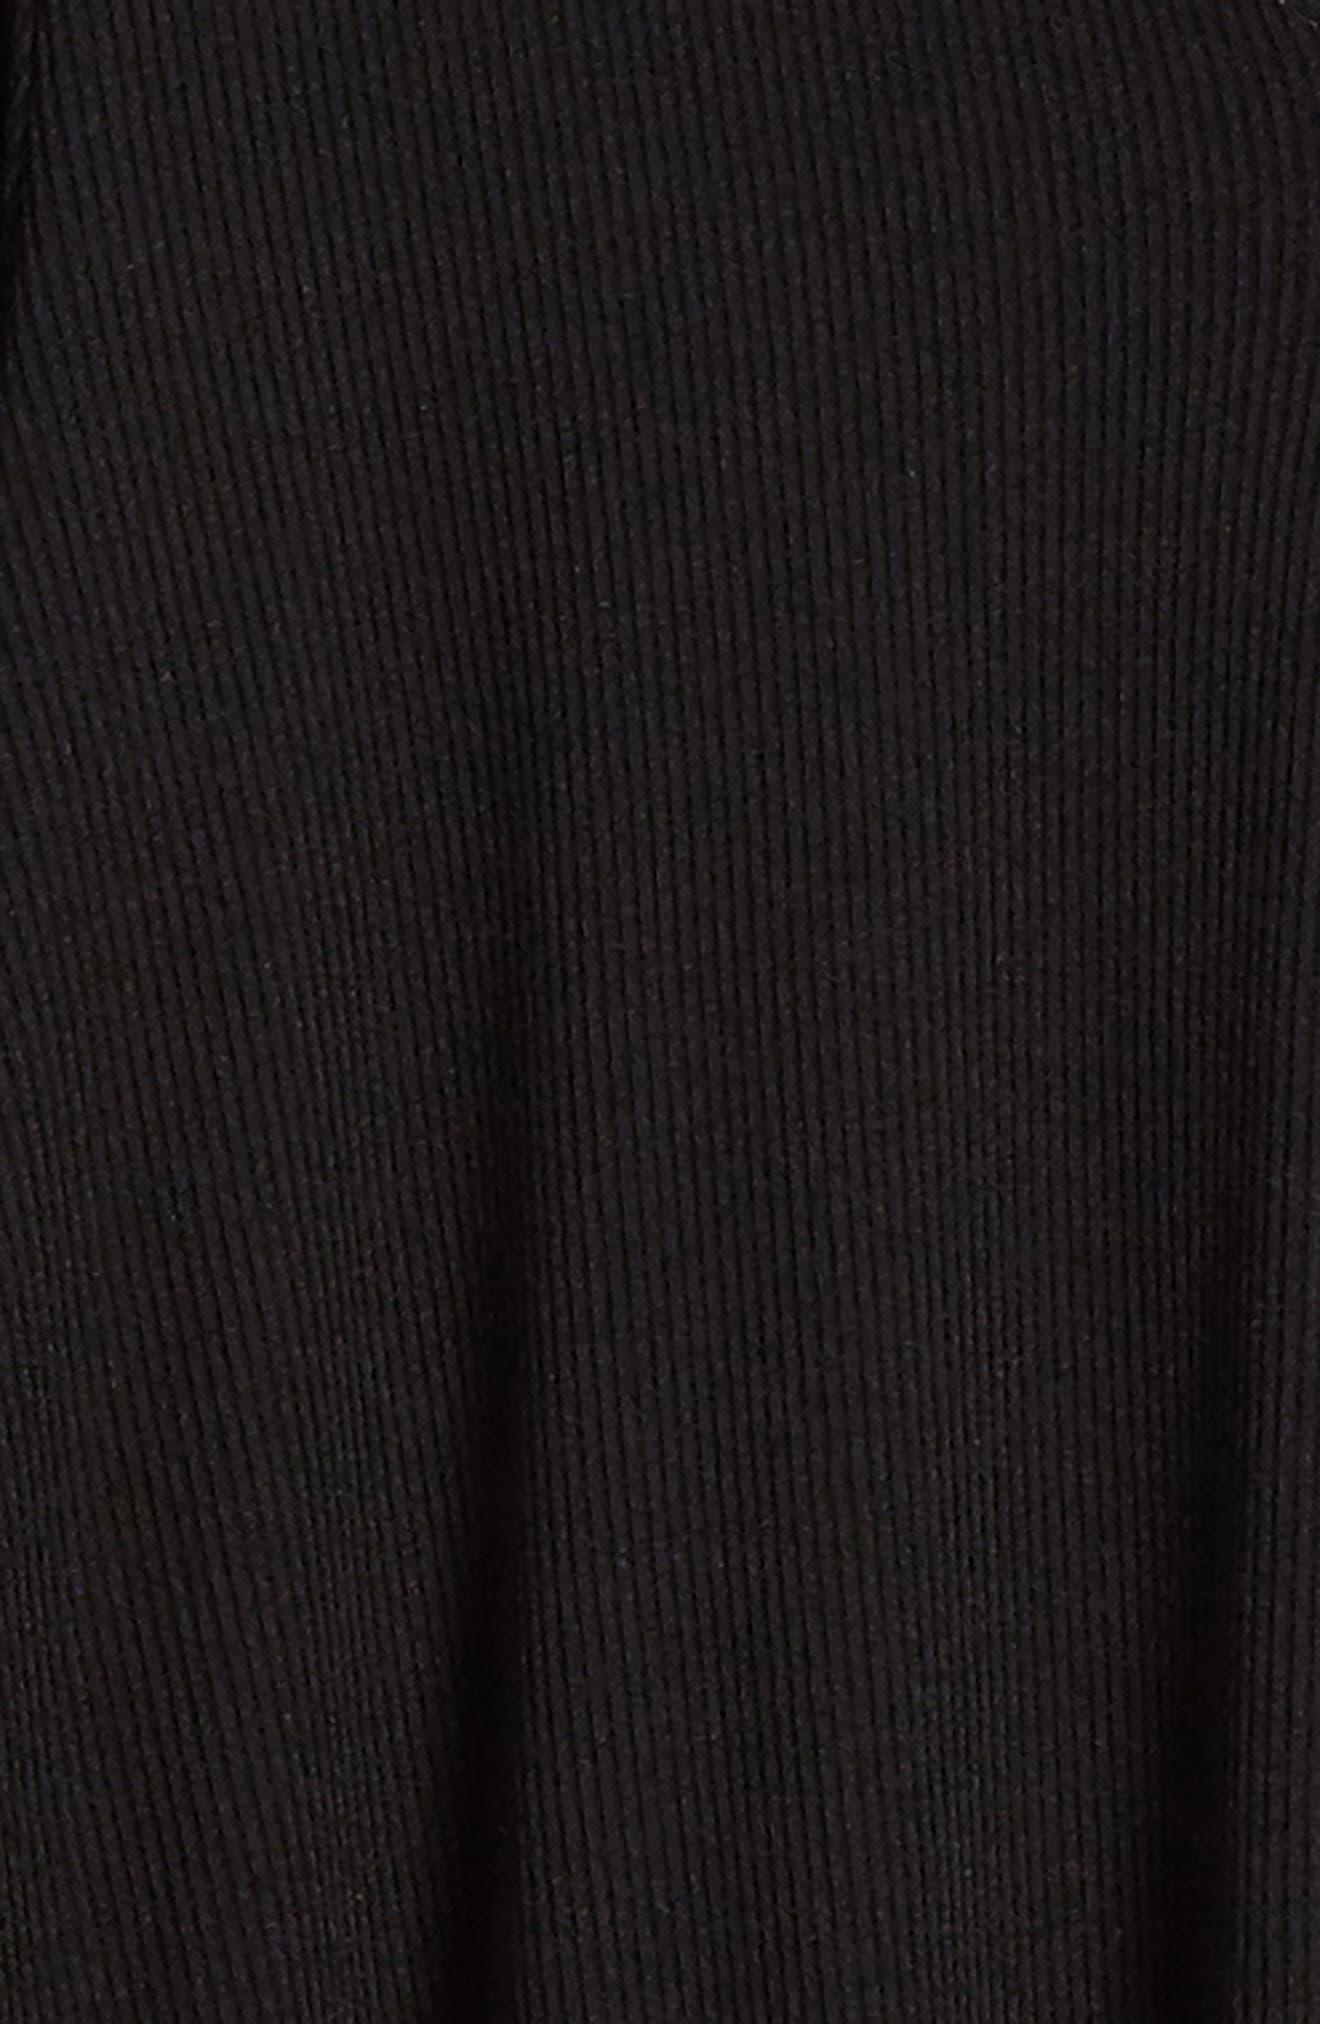 Mock Neck Knit Dress,                             Alternate thumbnail 3, color,                             Black